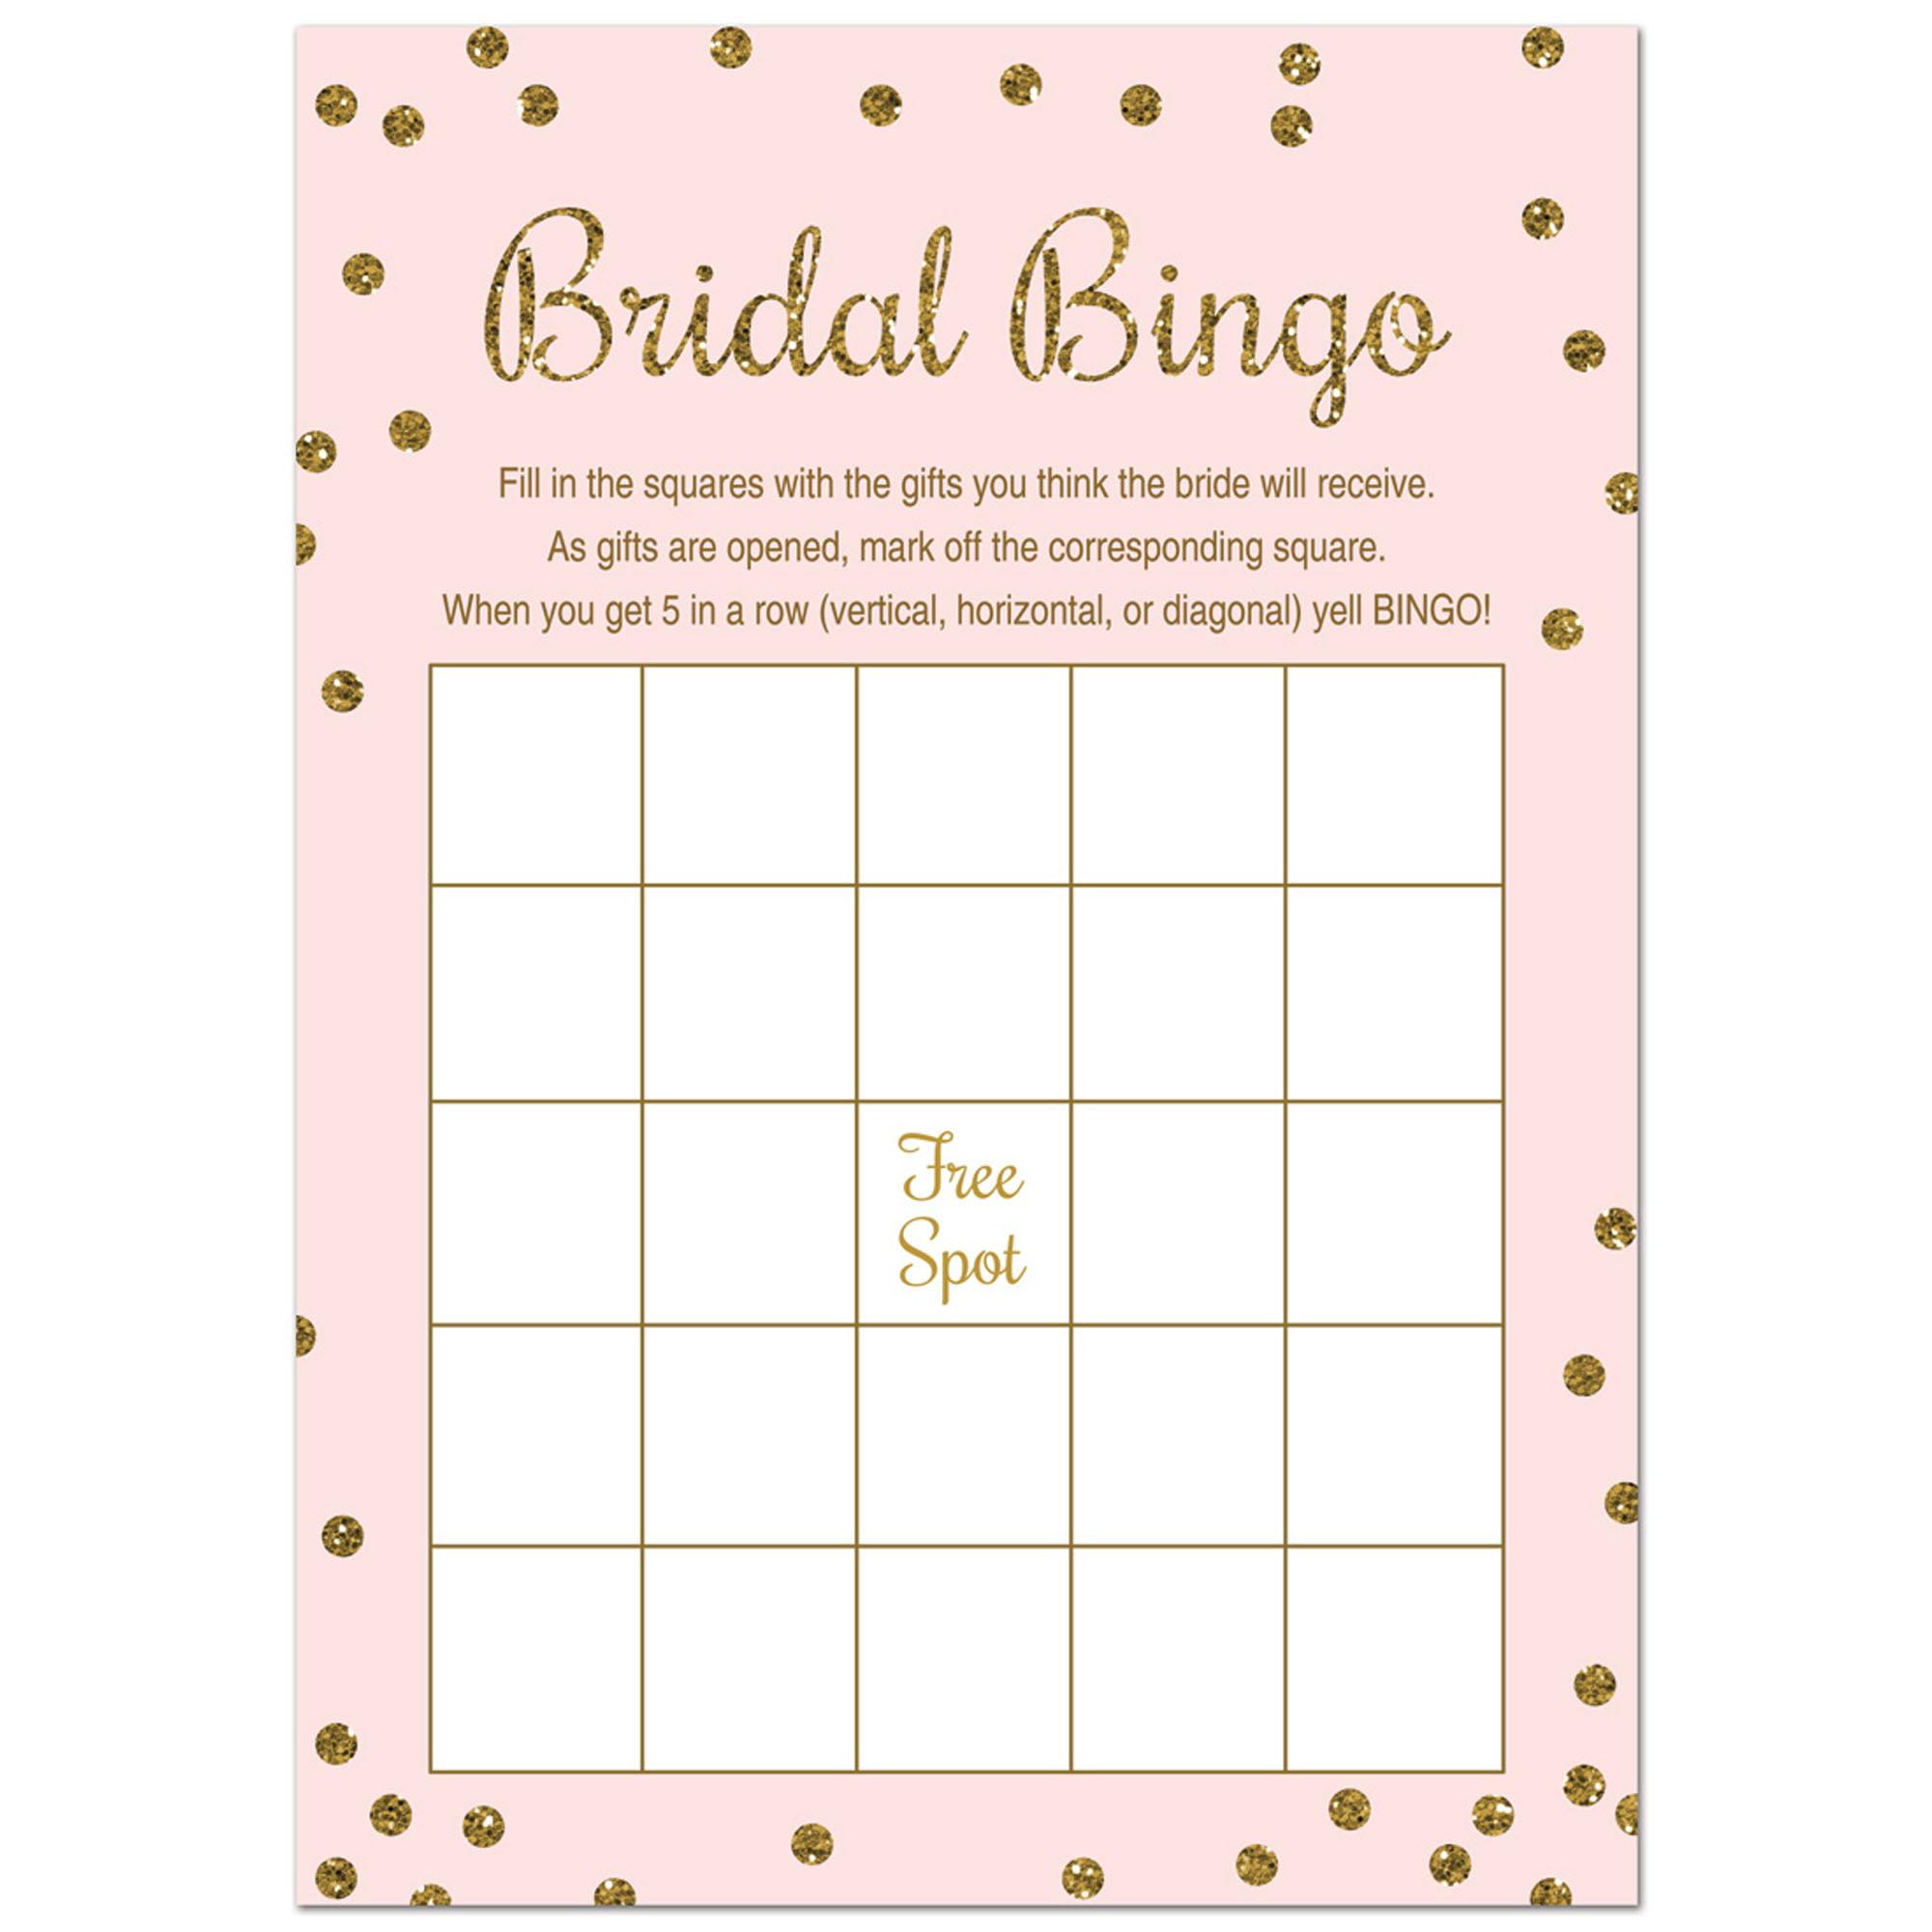 Bridal Shower Bingo  - Faux Gold Glitter on Pink - 24 Cards